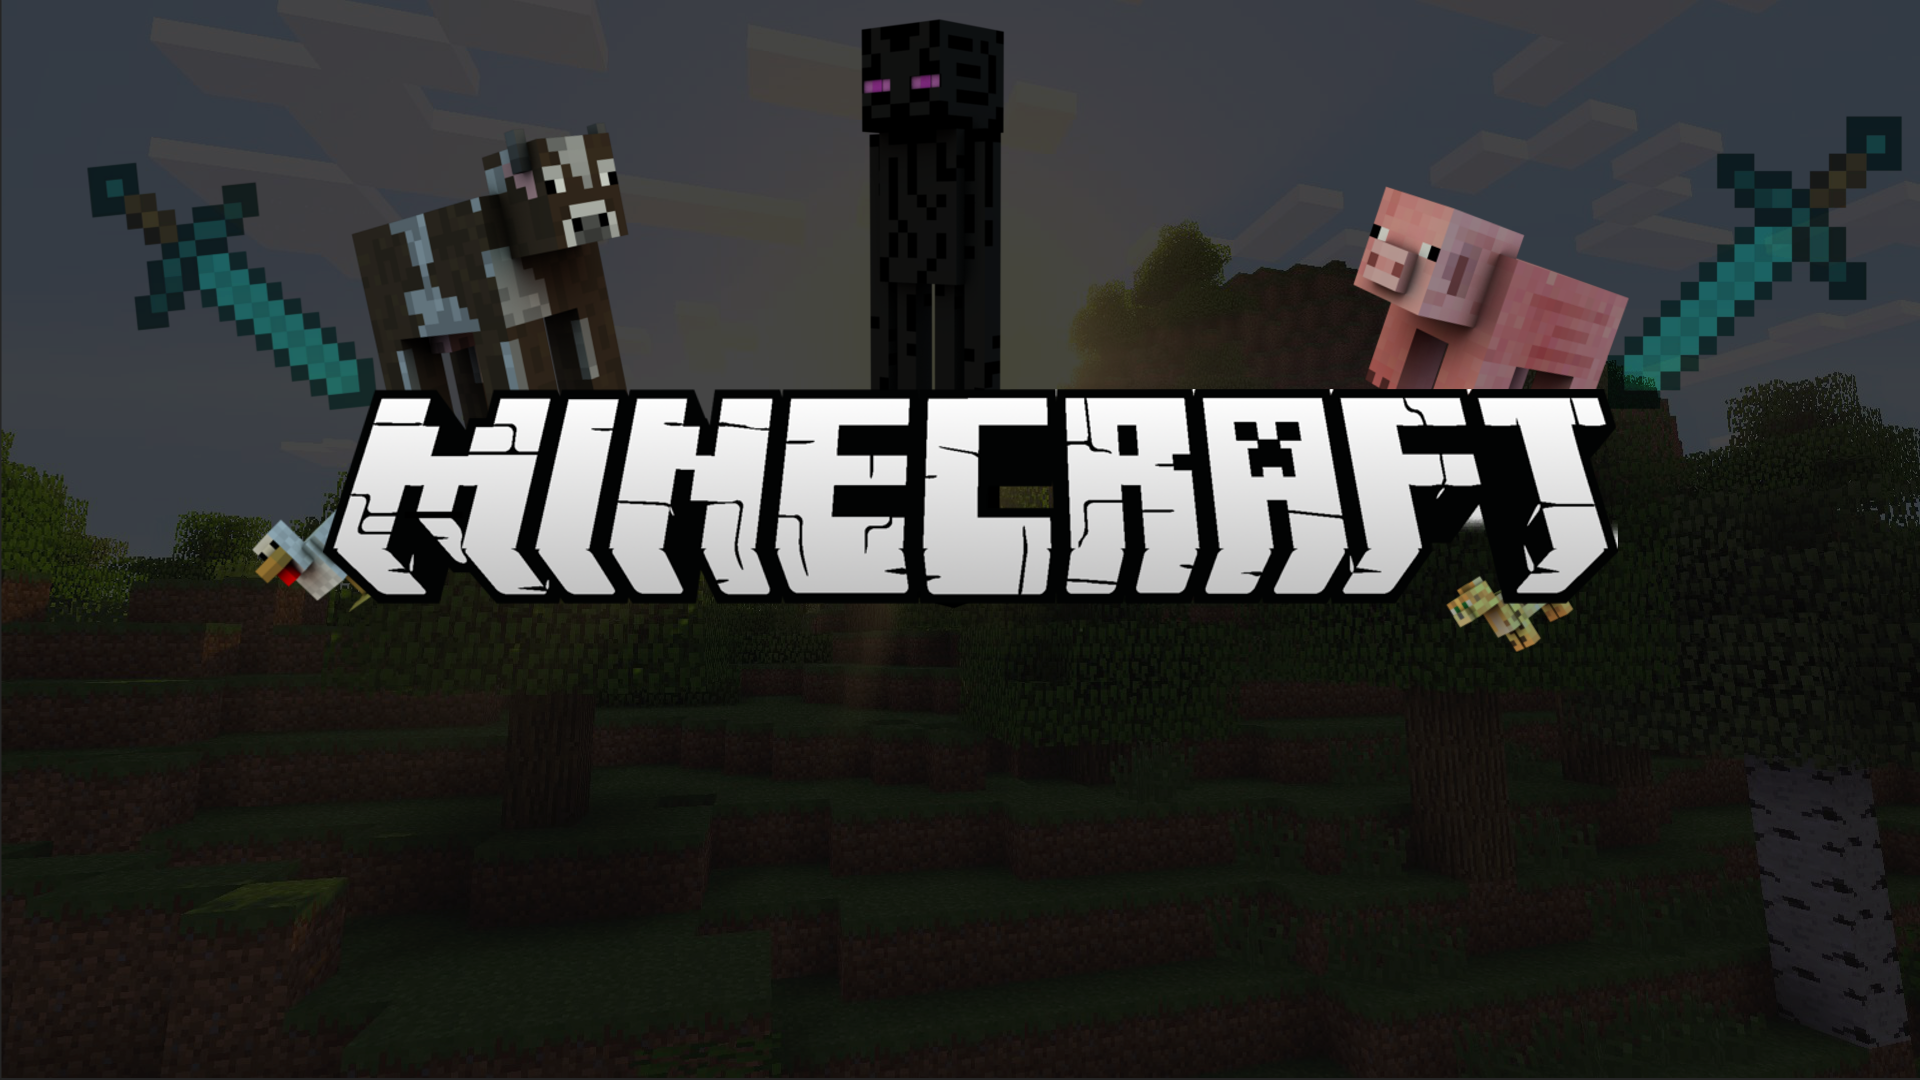 2048 By 1152 Of Minecraft: Minecraft Custom Wallpaper Full HD Wallpaper And